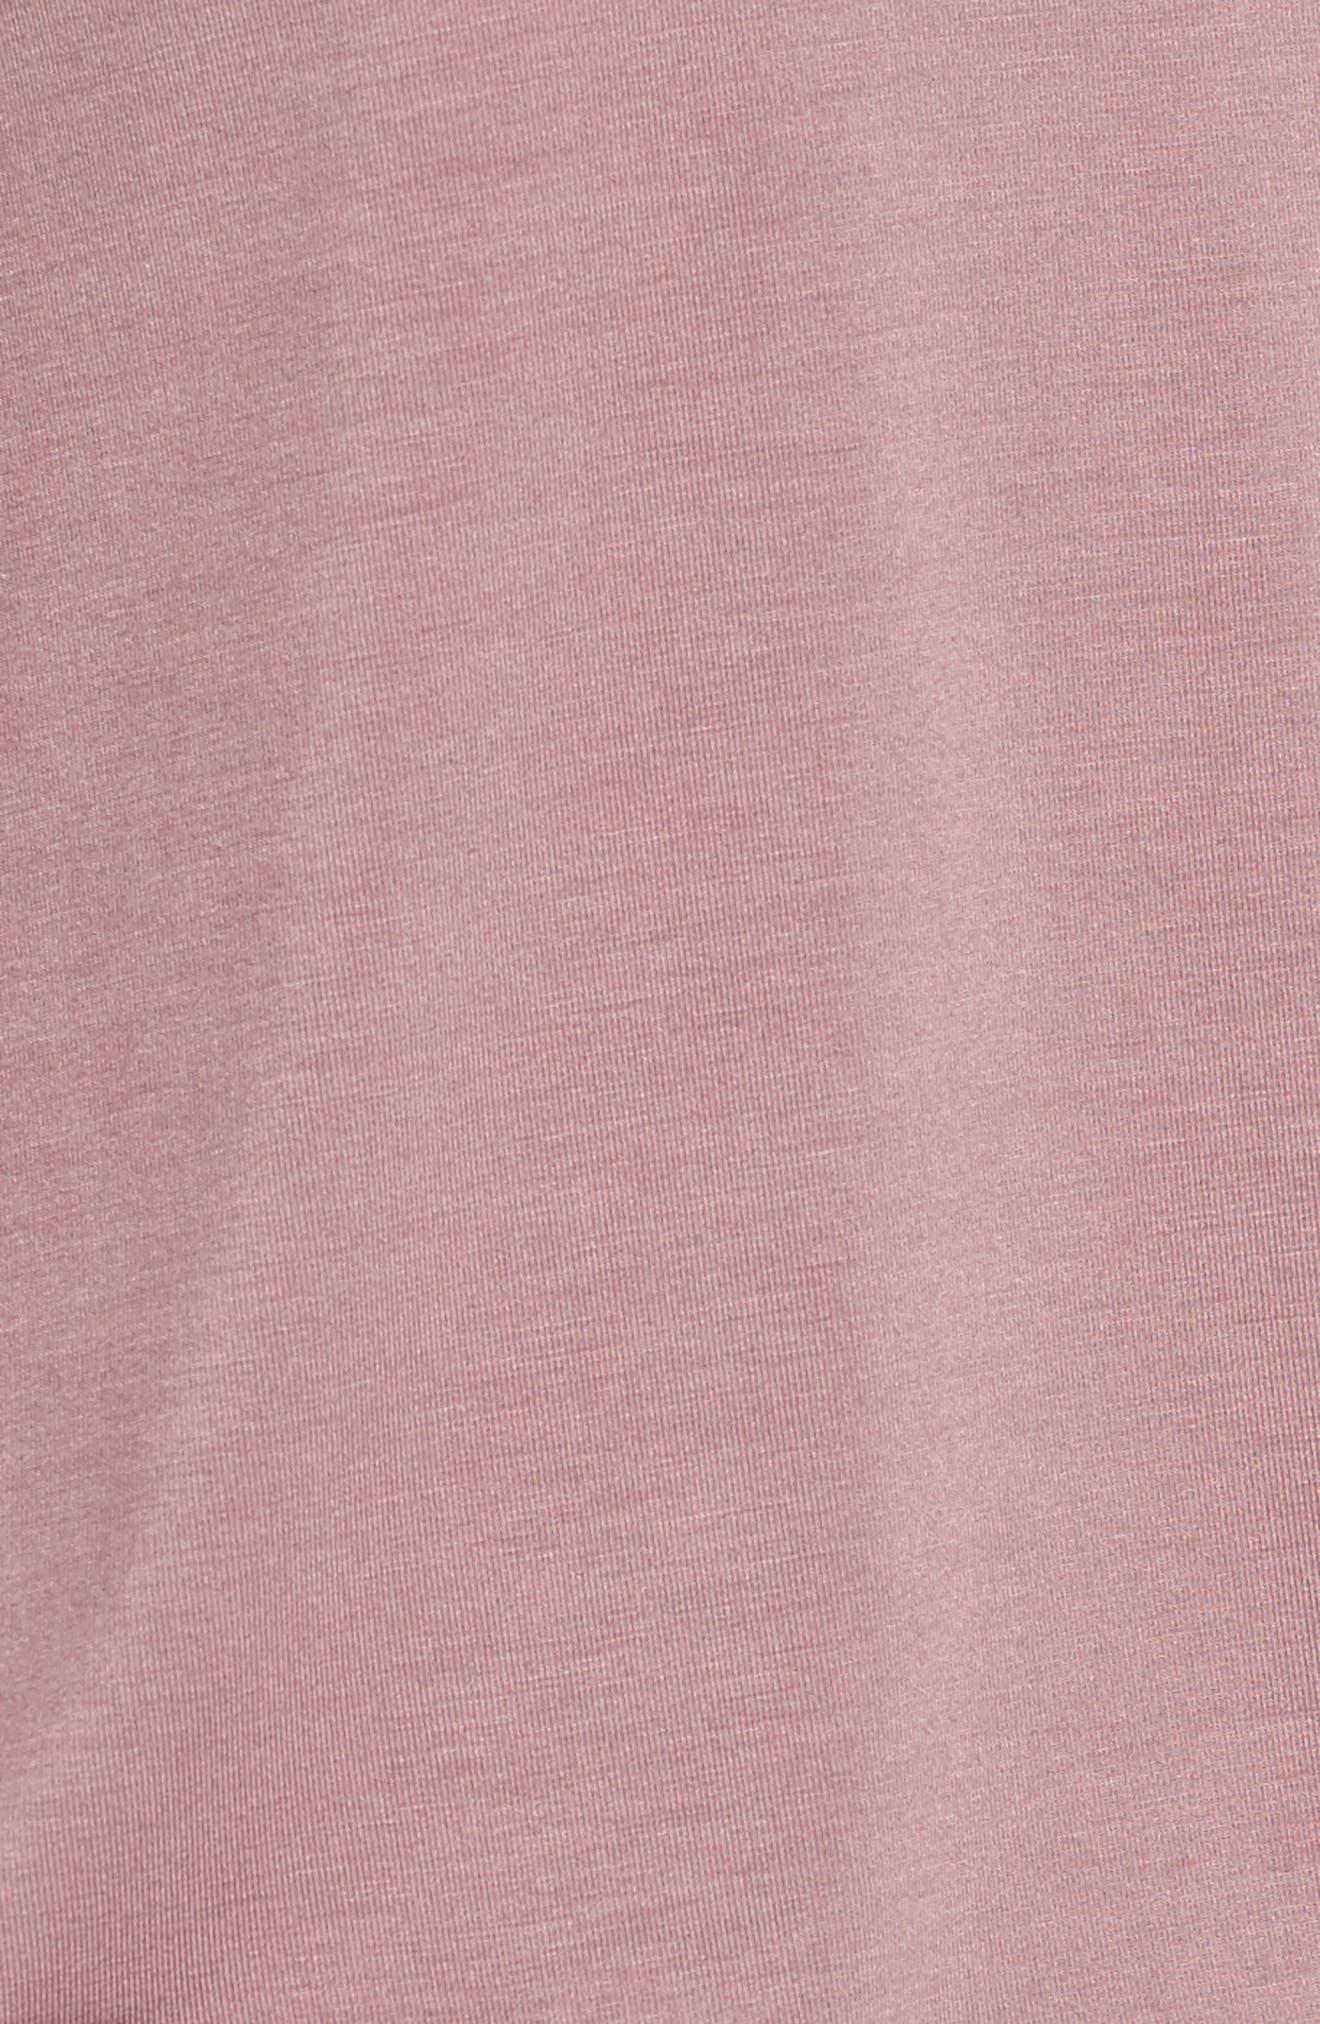 Alternate Image 5  - Bobeau Ruffle Detail Top (Regular & Petite)